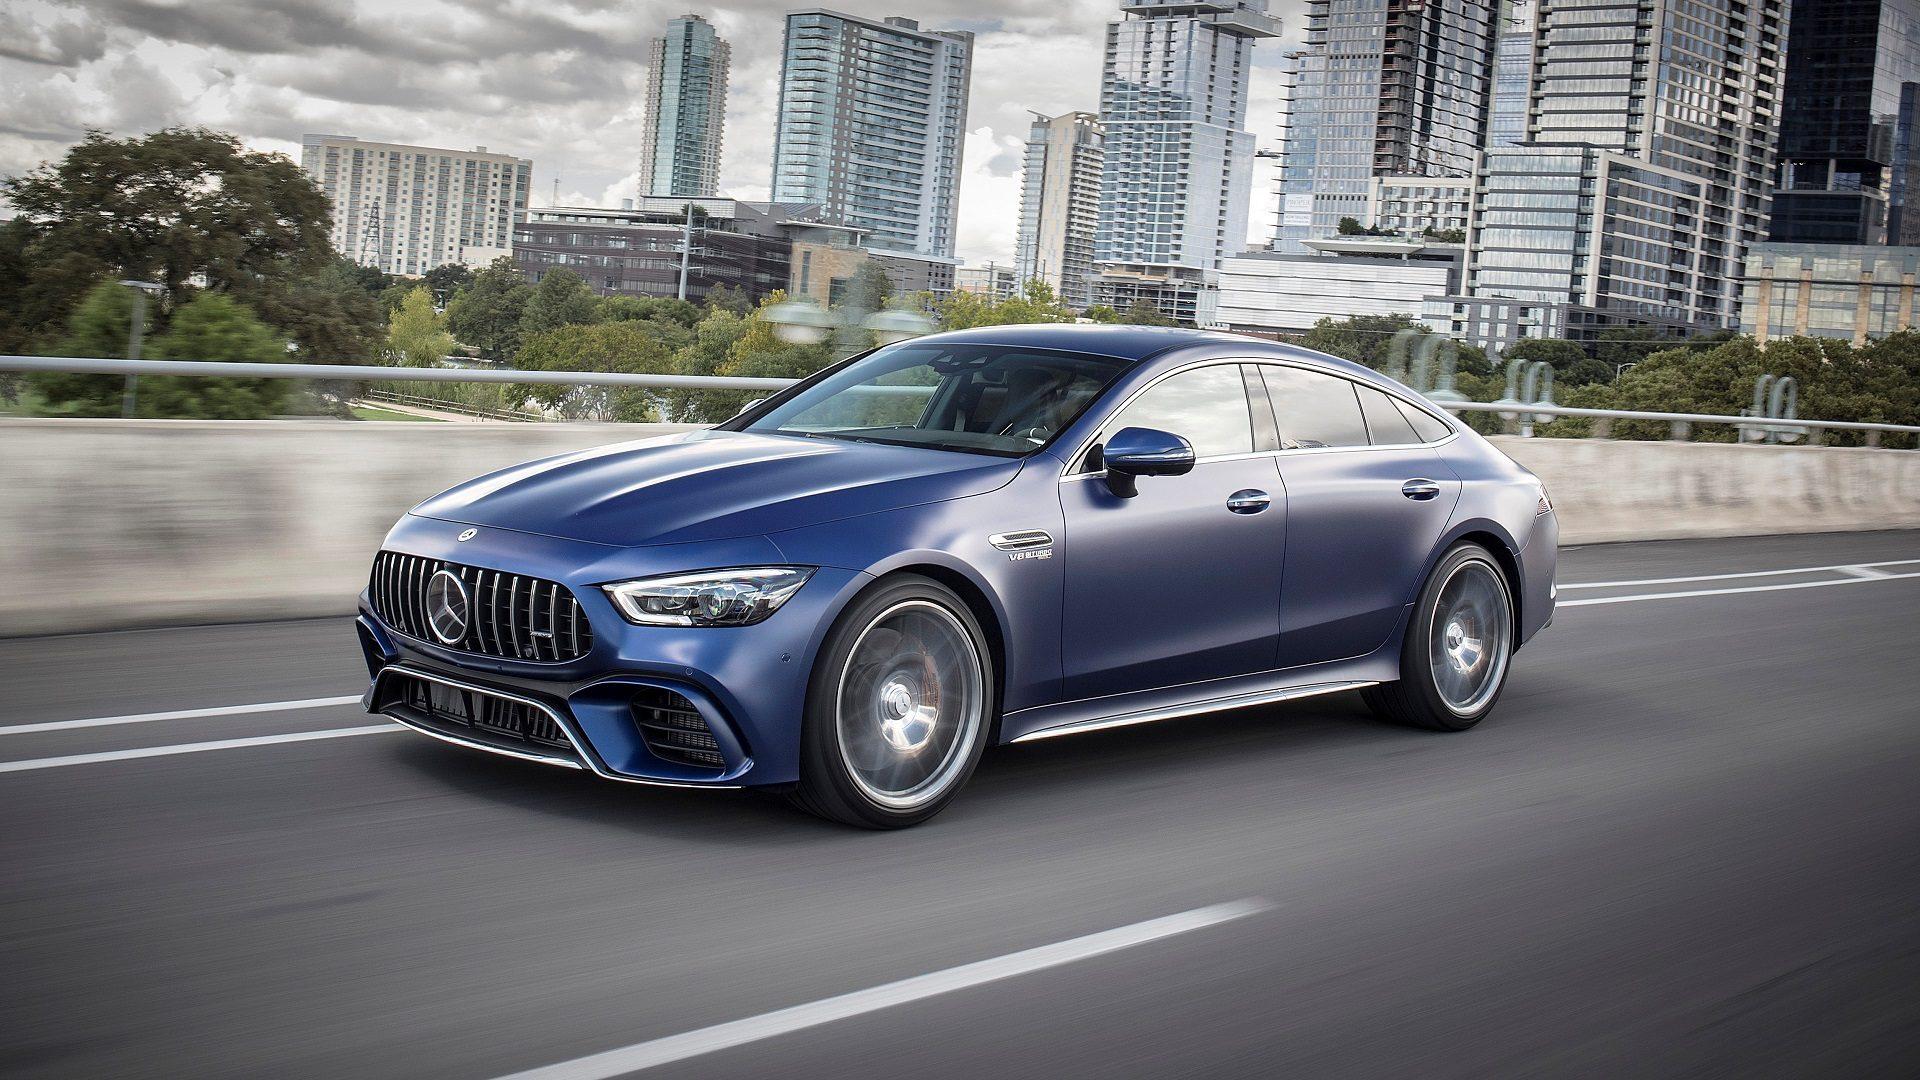 Auto Expo 2020: Mercedes-AMG GT 63 S 4MATIC+ 4-Door Coupé Launched | CarSaar